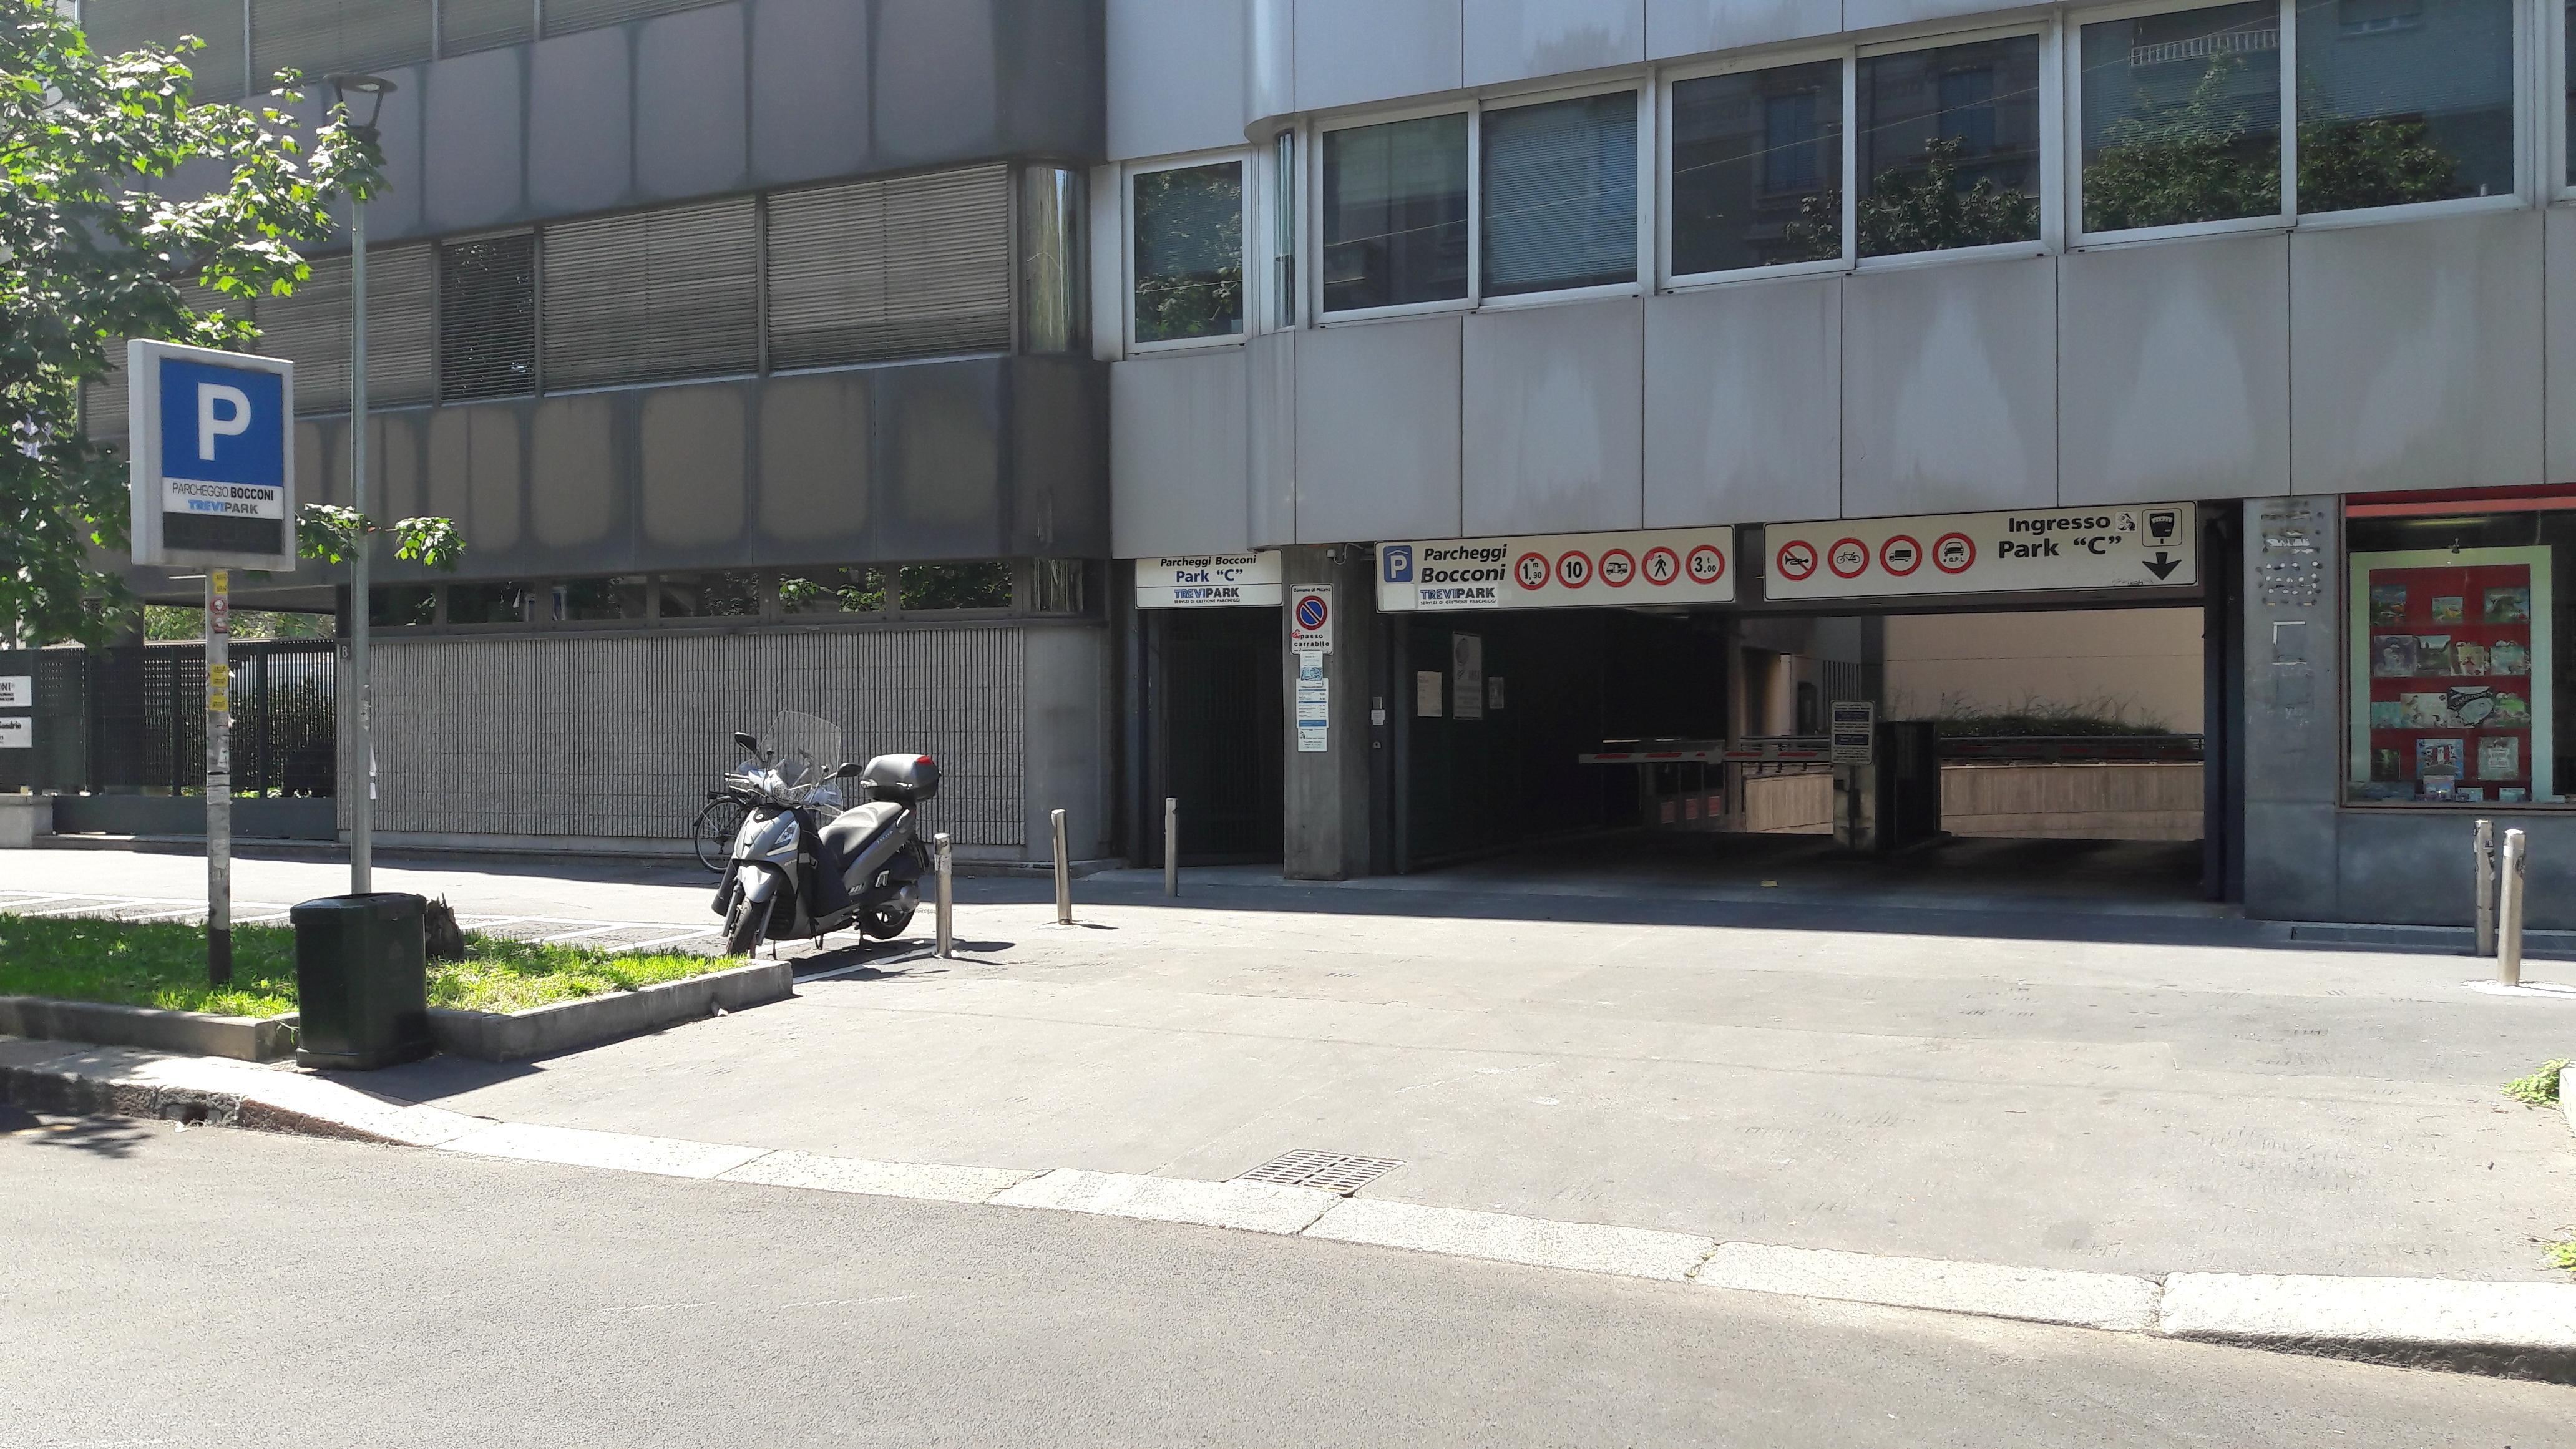 Parcheggi Bocconi C Parking In Milano Parkme